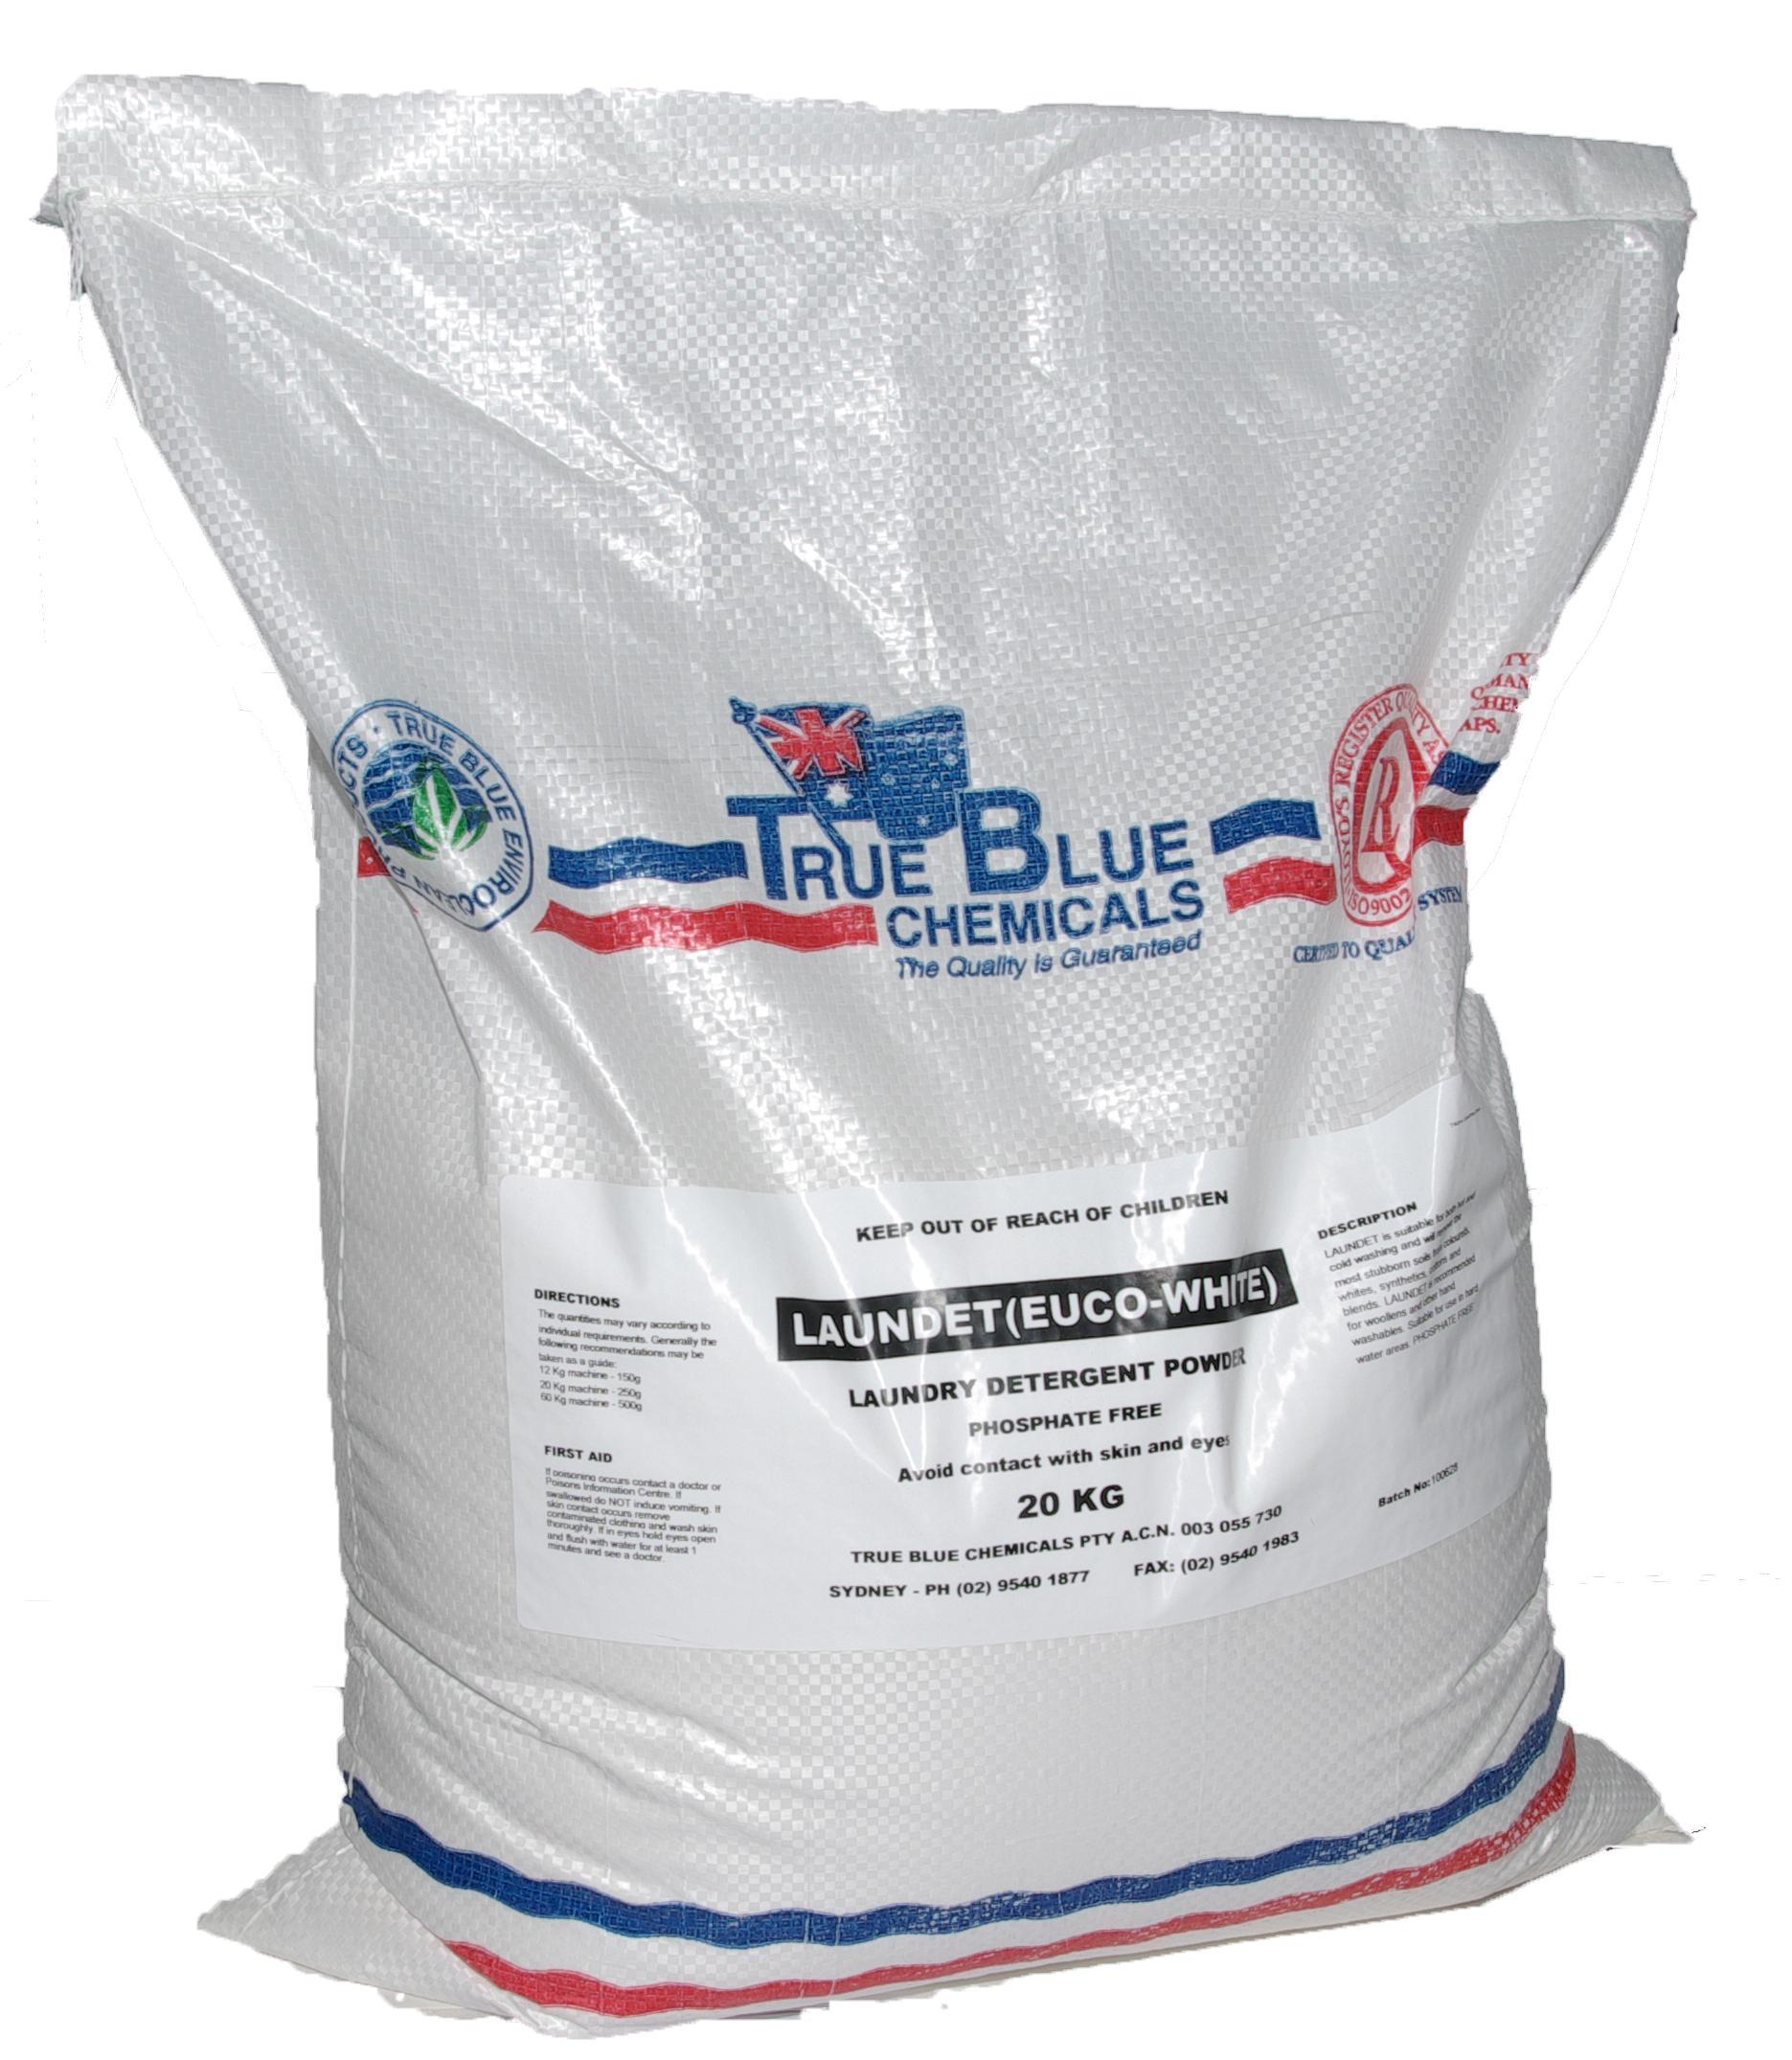 True Blue Laundet Laundry Powder 20kgBAG